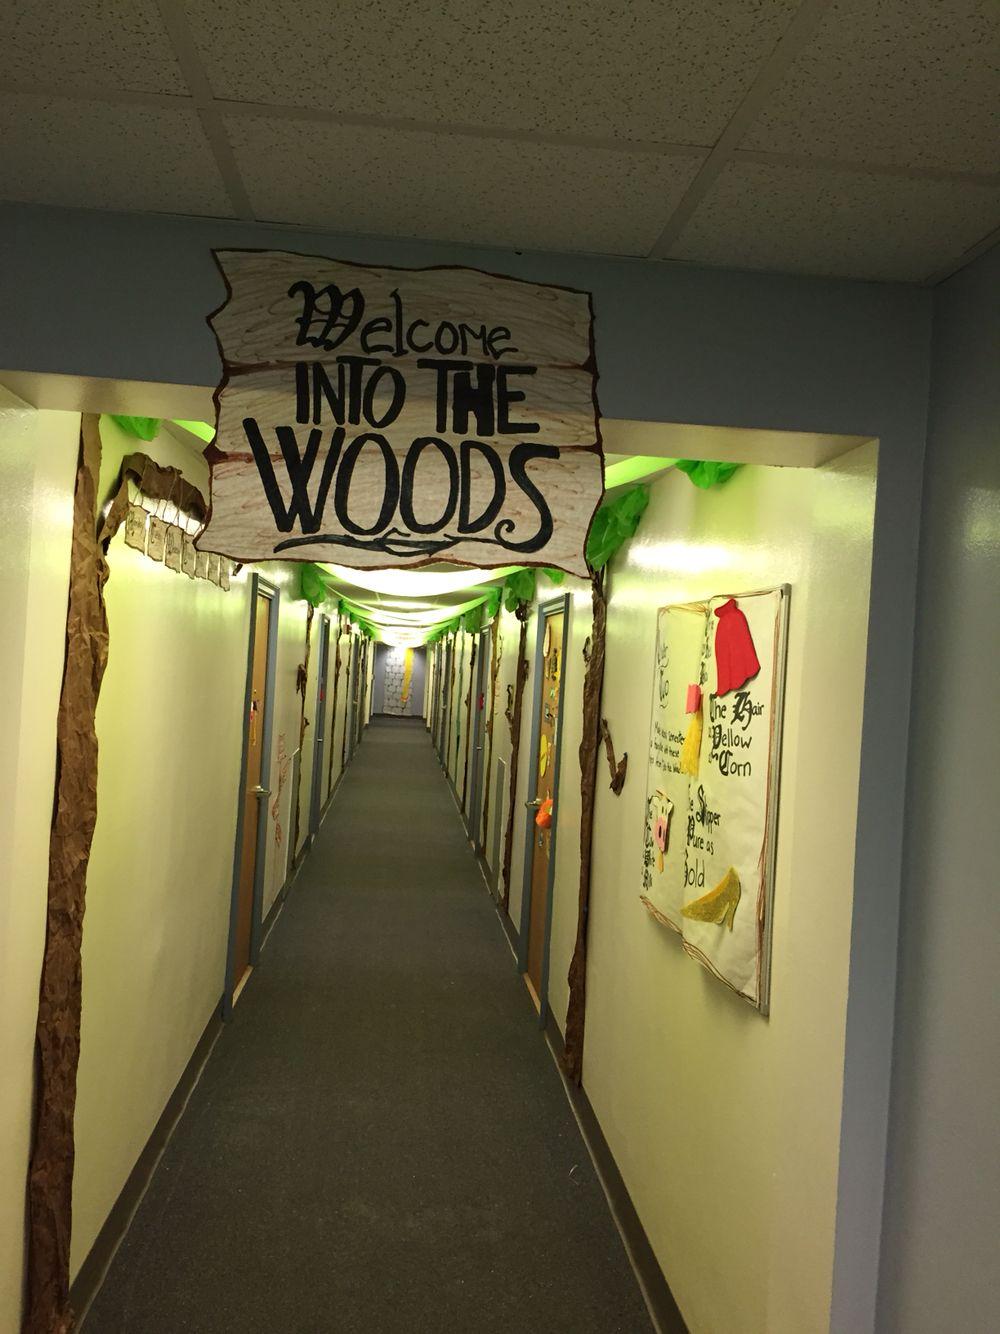 Hallway floor decor  Into the Woods floor theme  RA  RA Floor Themes  Pinterest